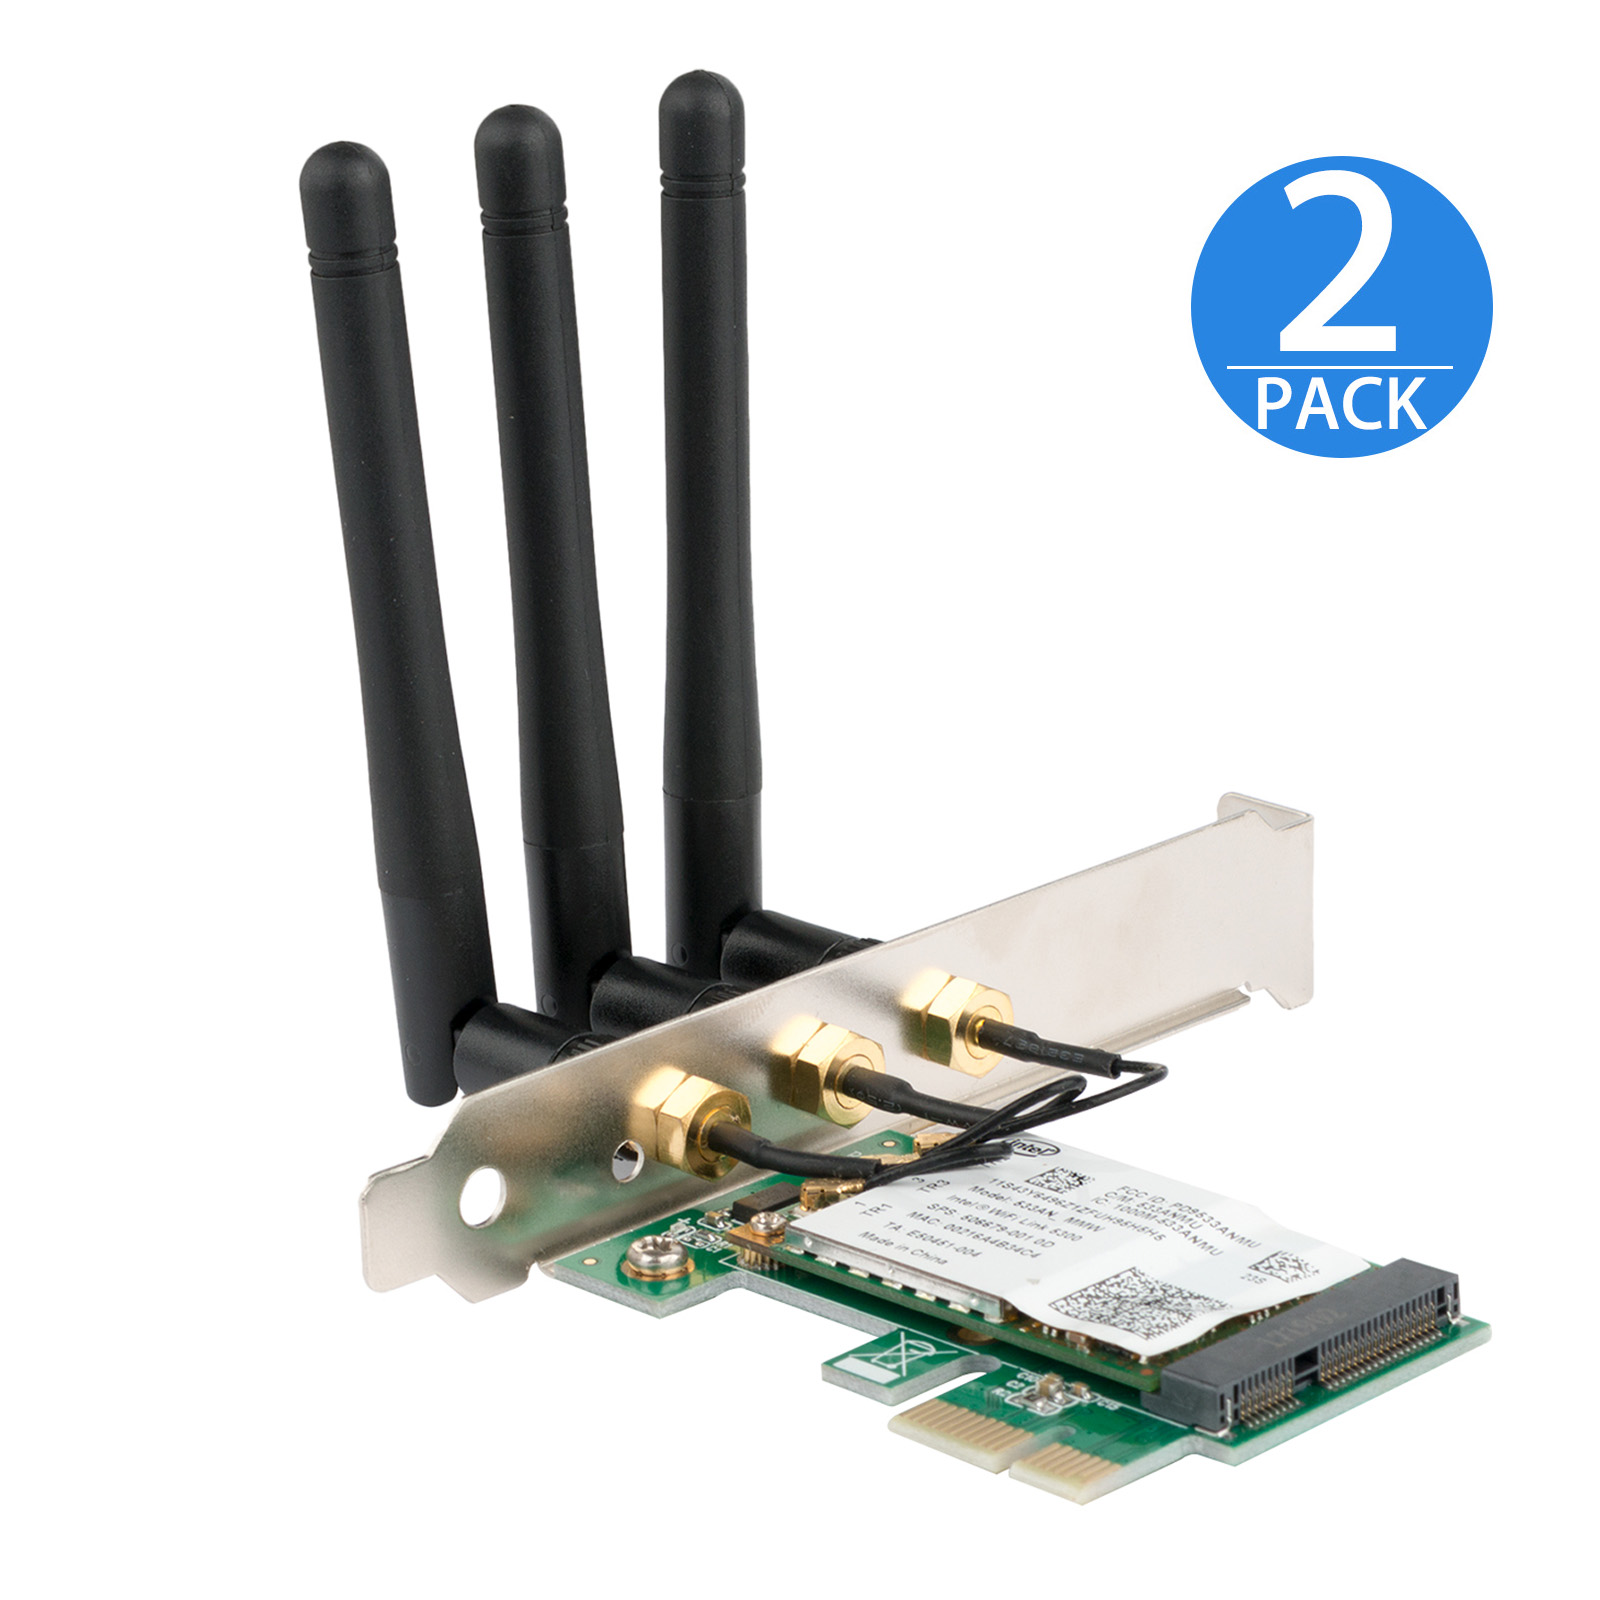 1-2-Pcs-450Mbps-PCI-E-WiFi-wireless-Card-Adapter-Antennas-for-Desktop-Laptop-PC